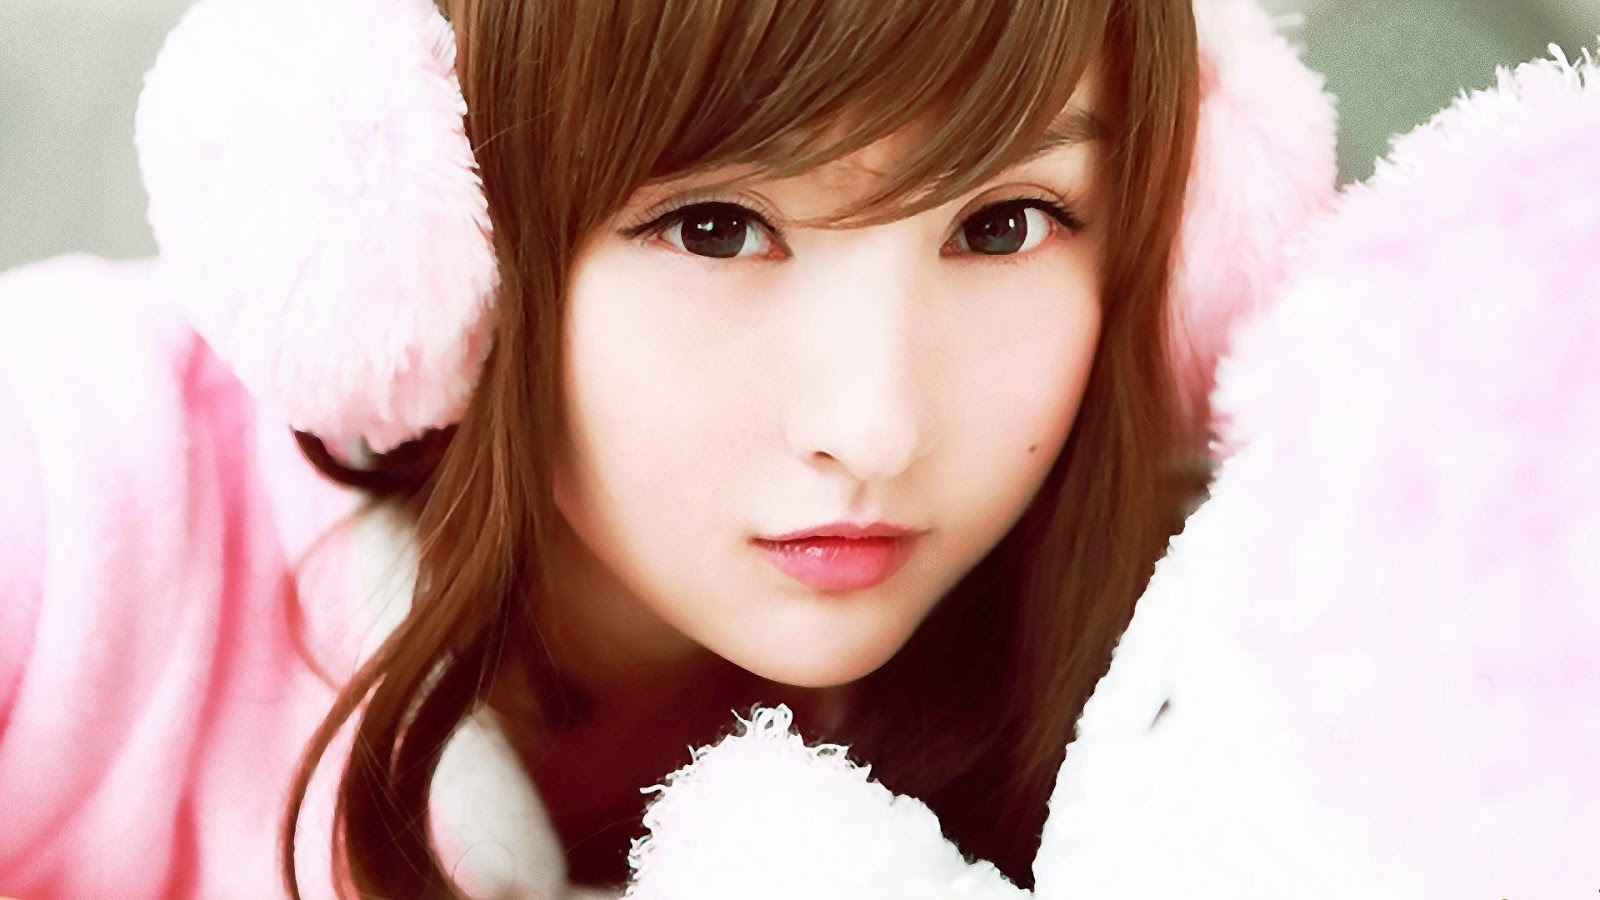 beautiful chinese girls wallpapers free download | most beautiful